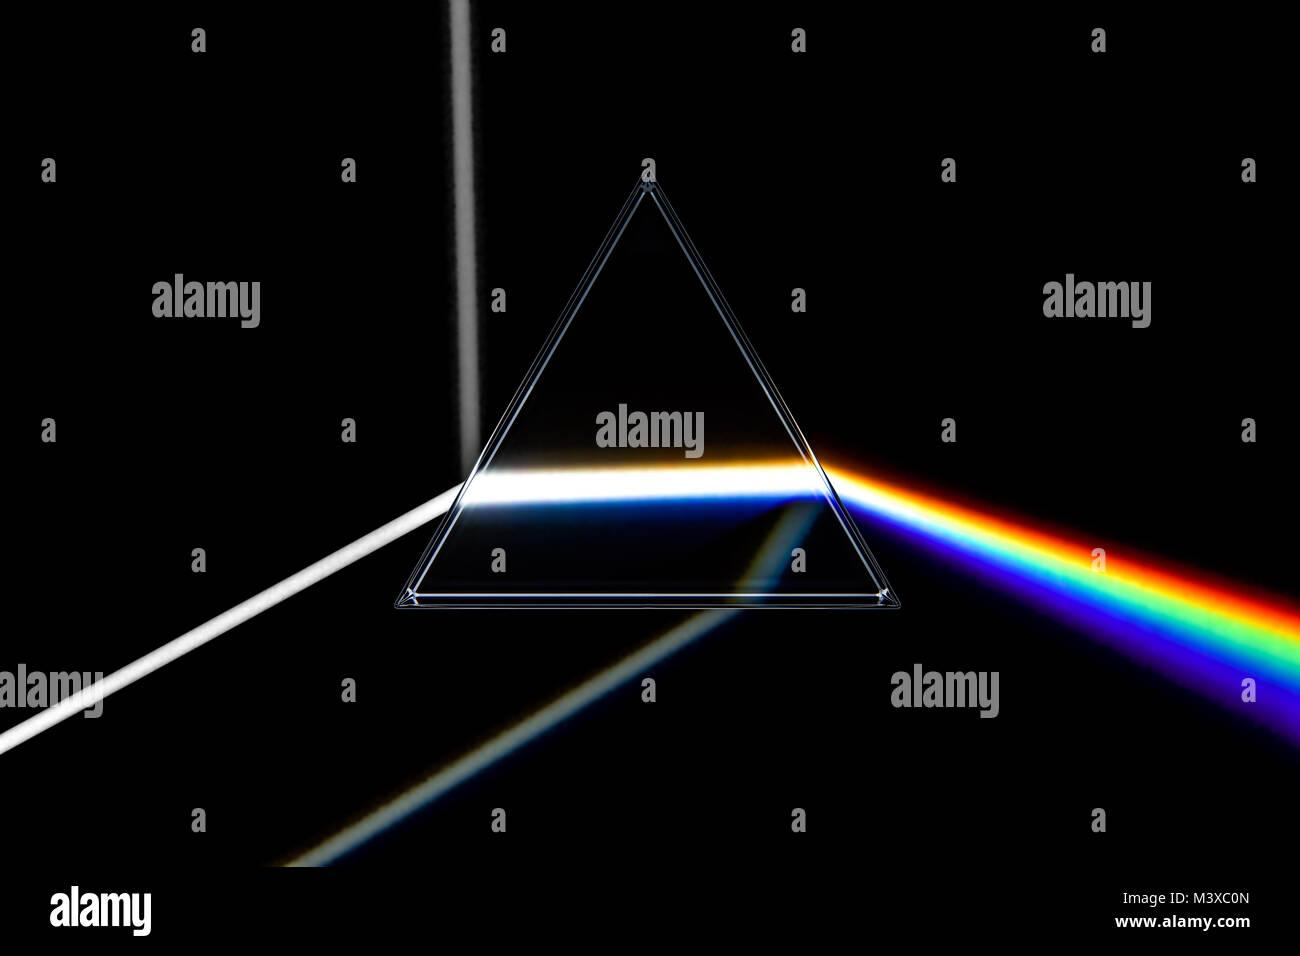 Spectrum Visible Light Stock Photos Amp Spectrum Visible Light Stock Images